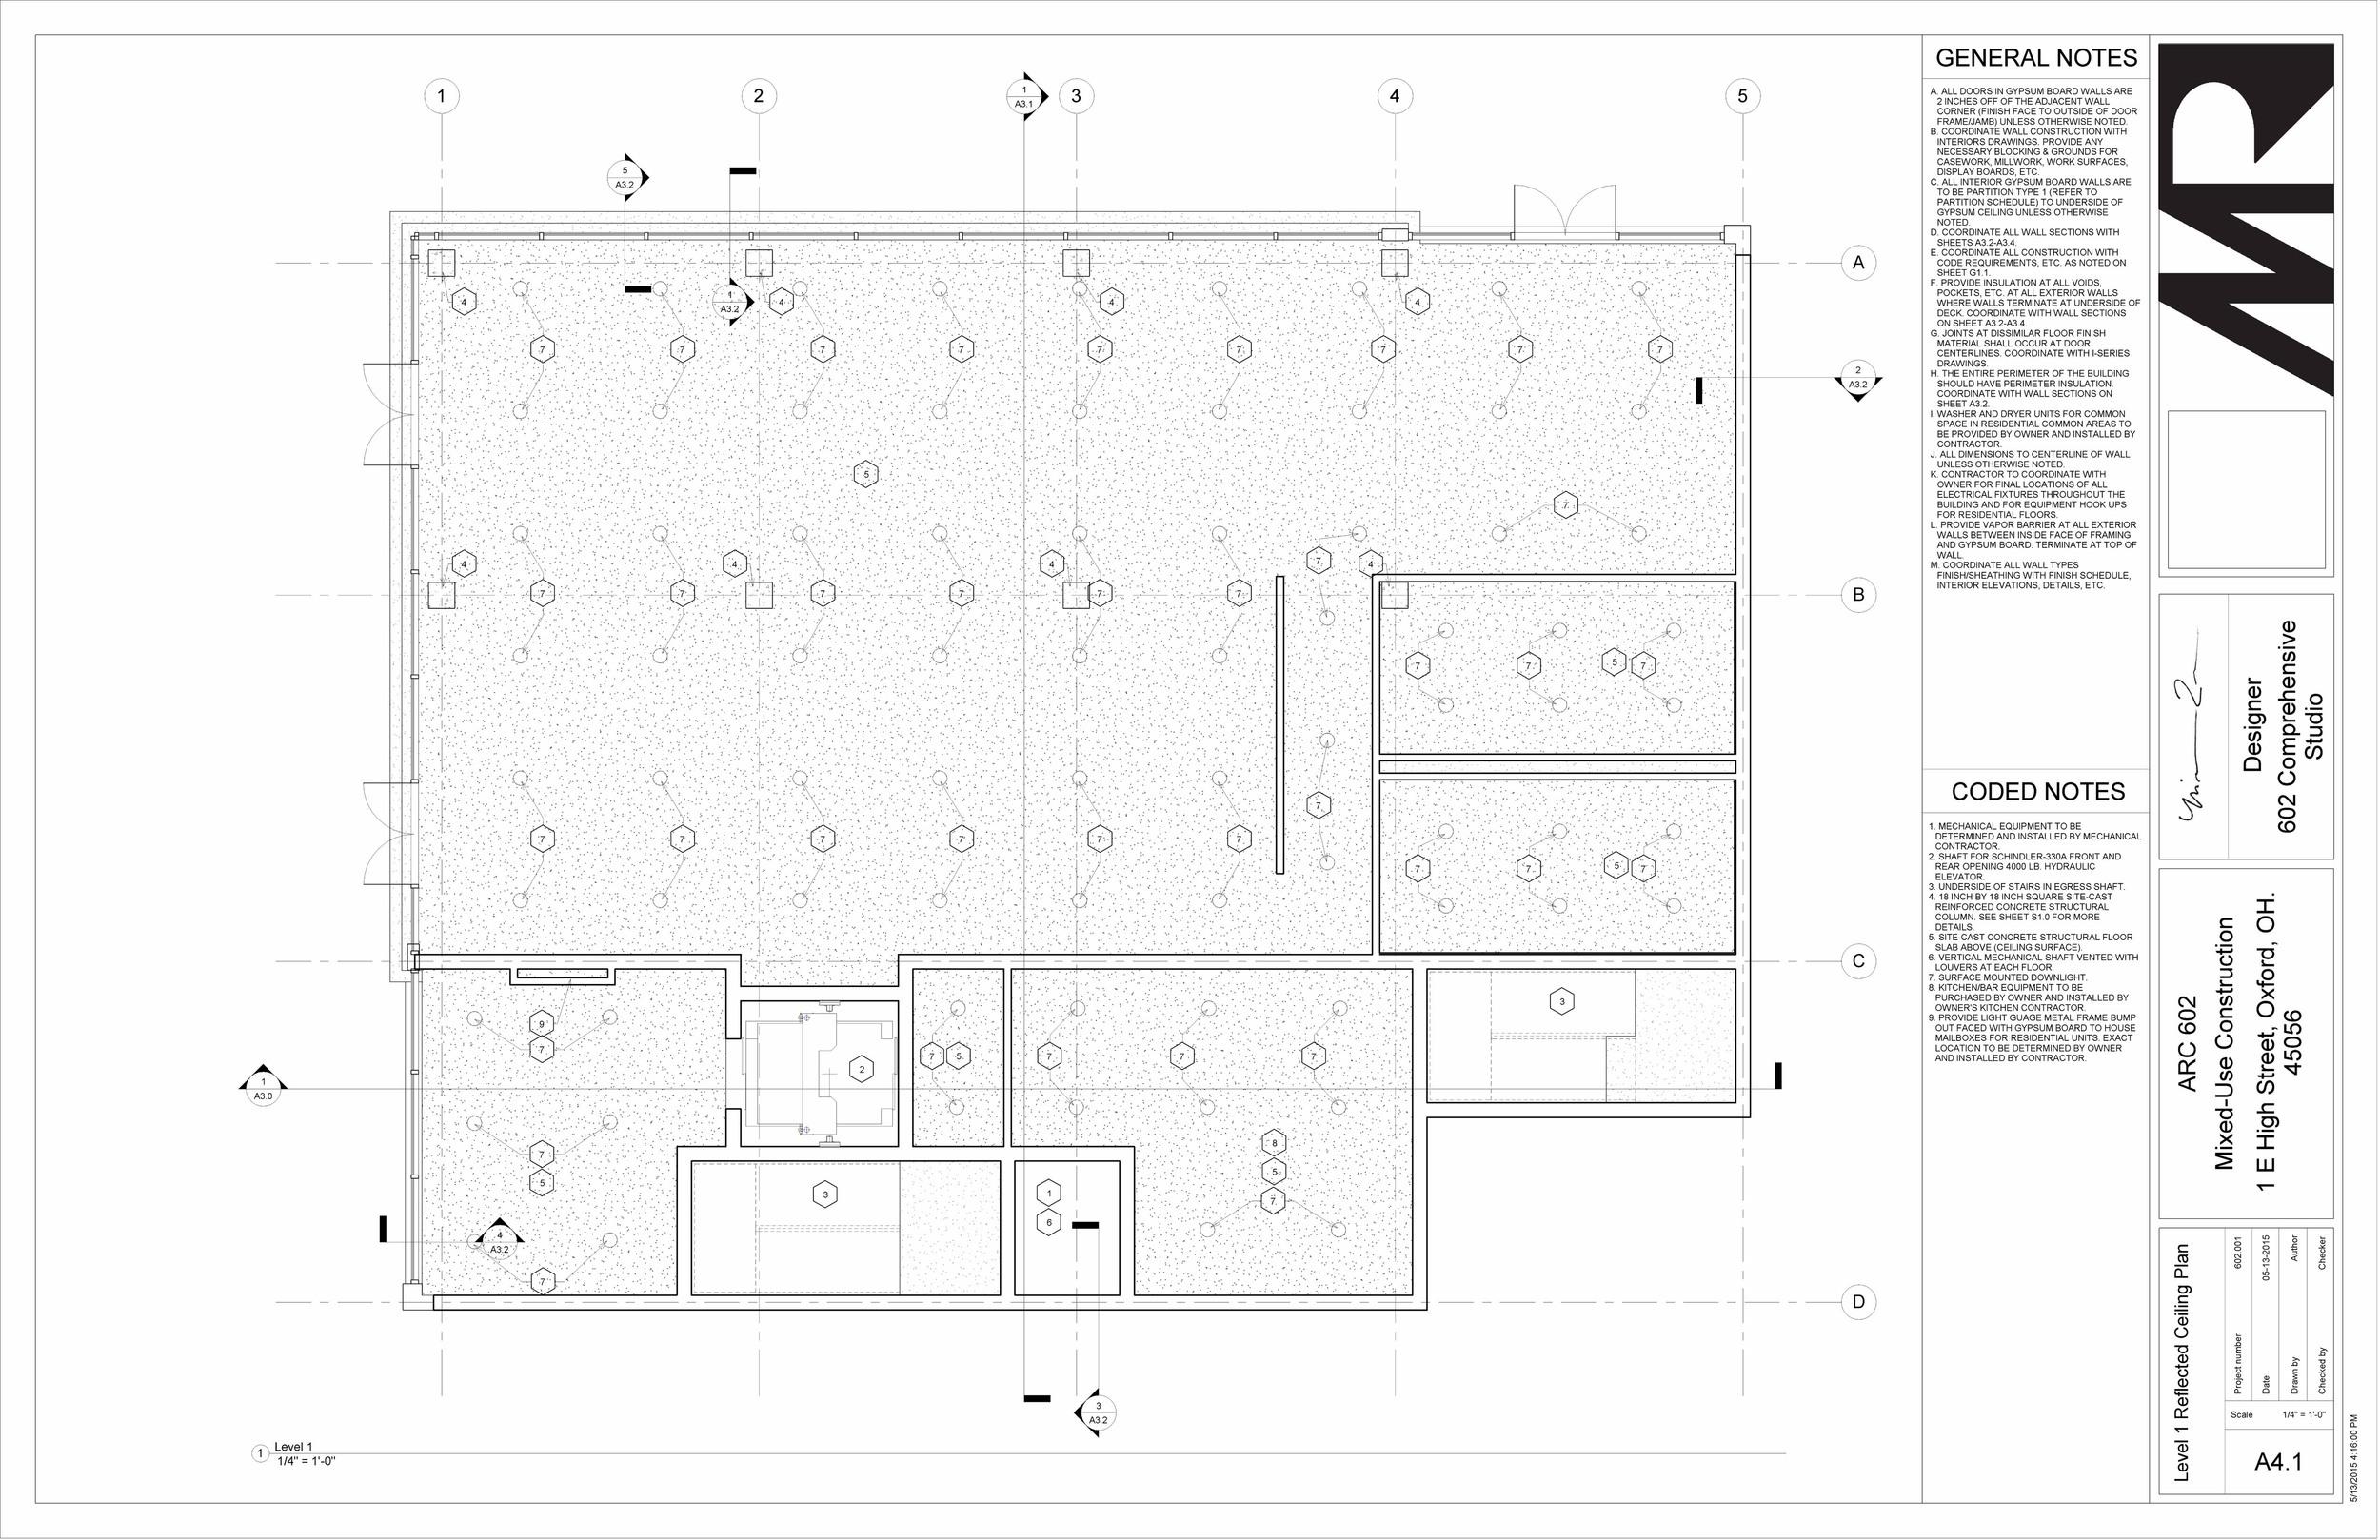 602 Studio - Sheet - A4-1 - Level 1 Reflected Ceiling Plan.jpg